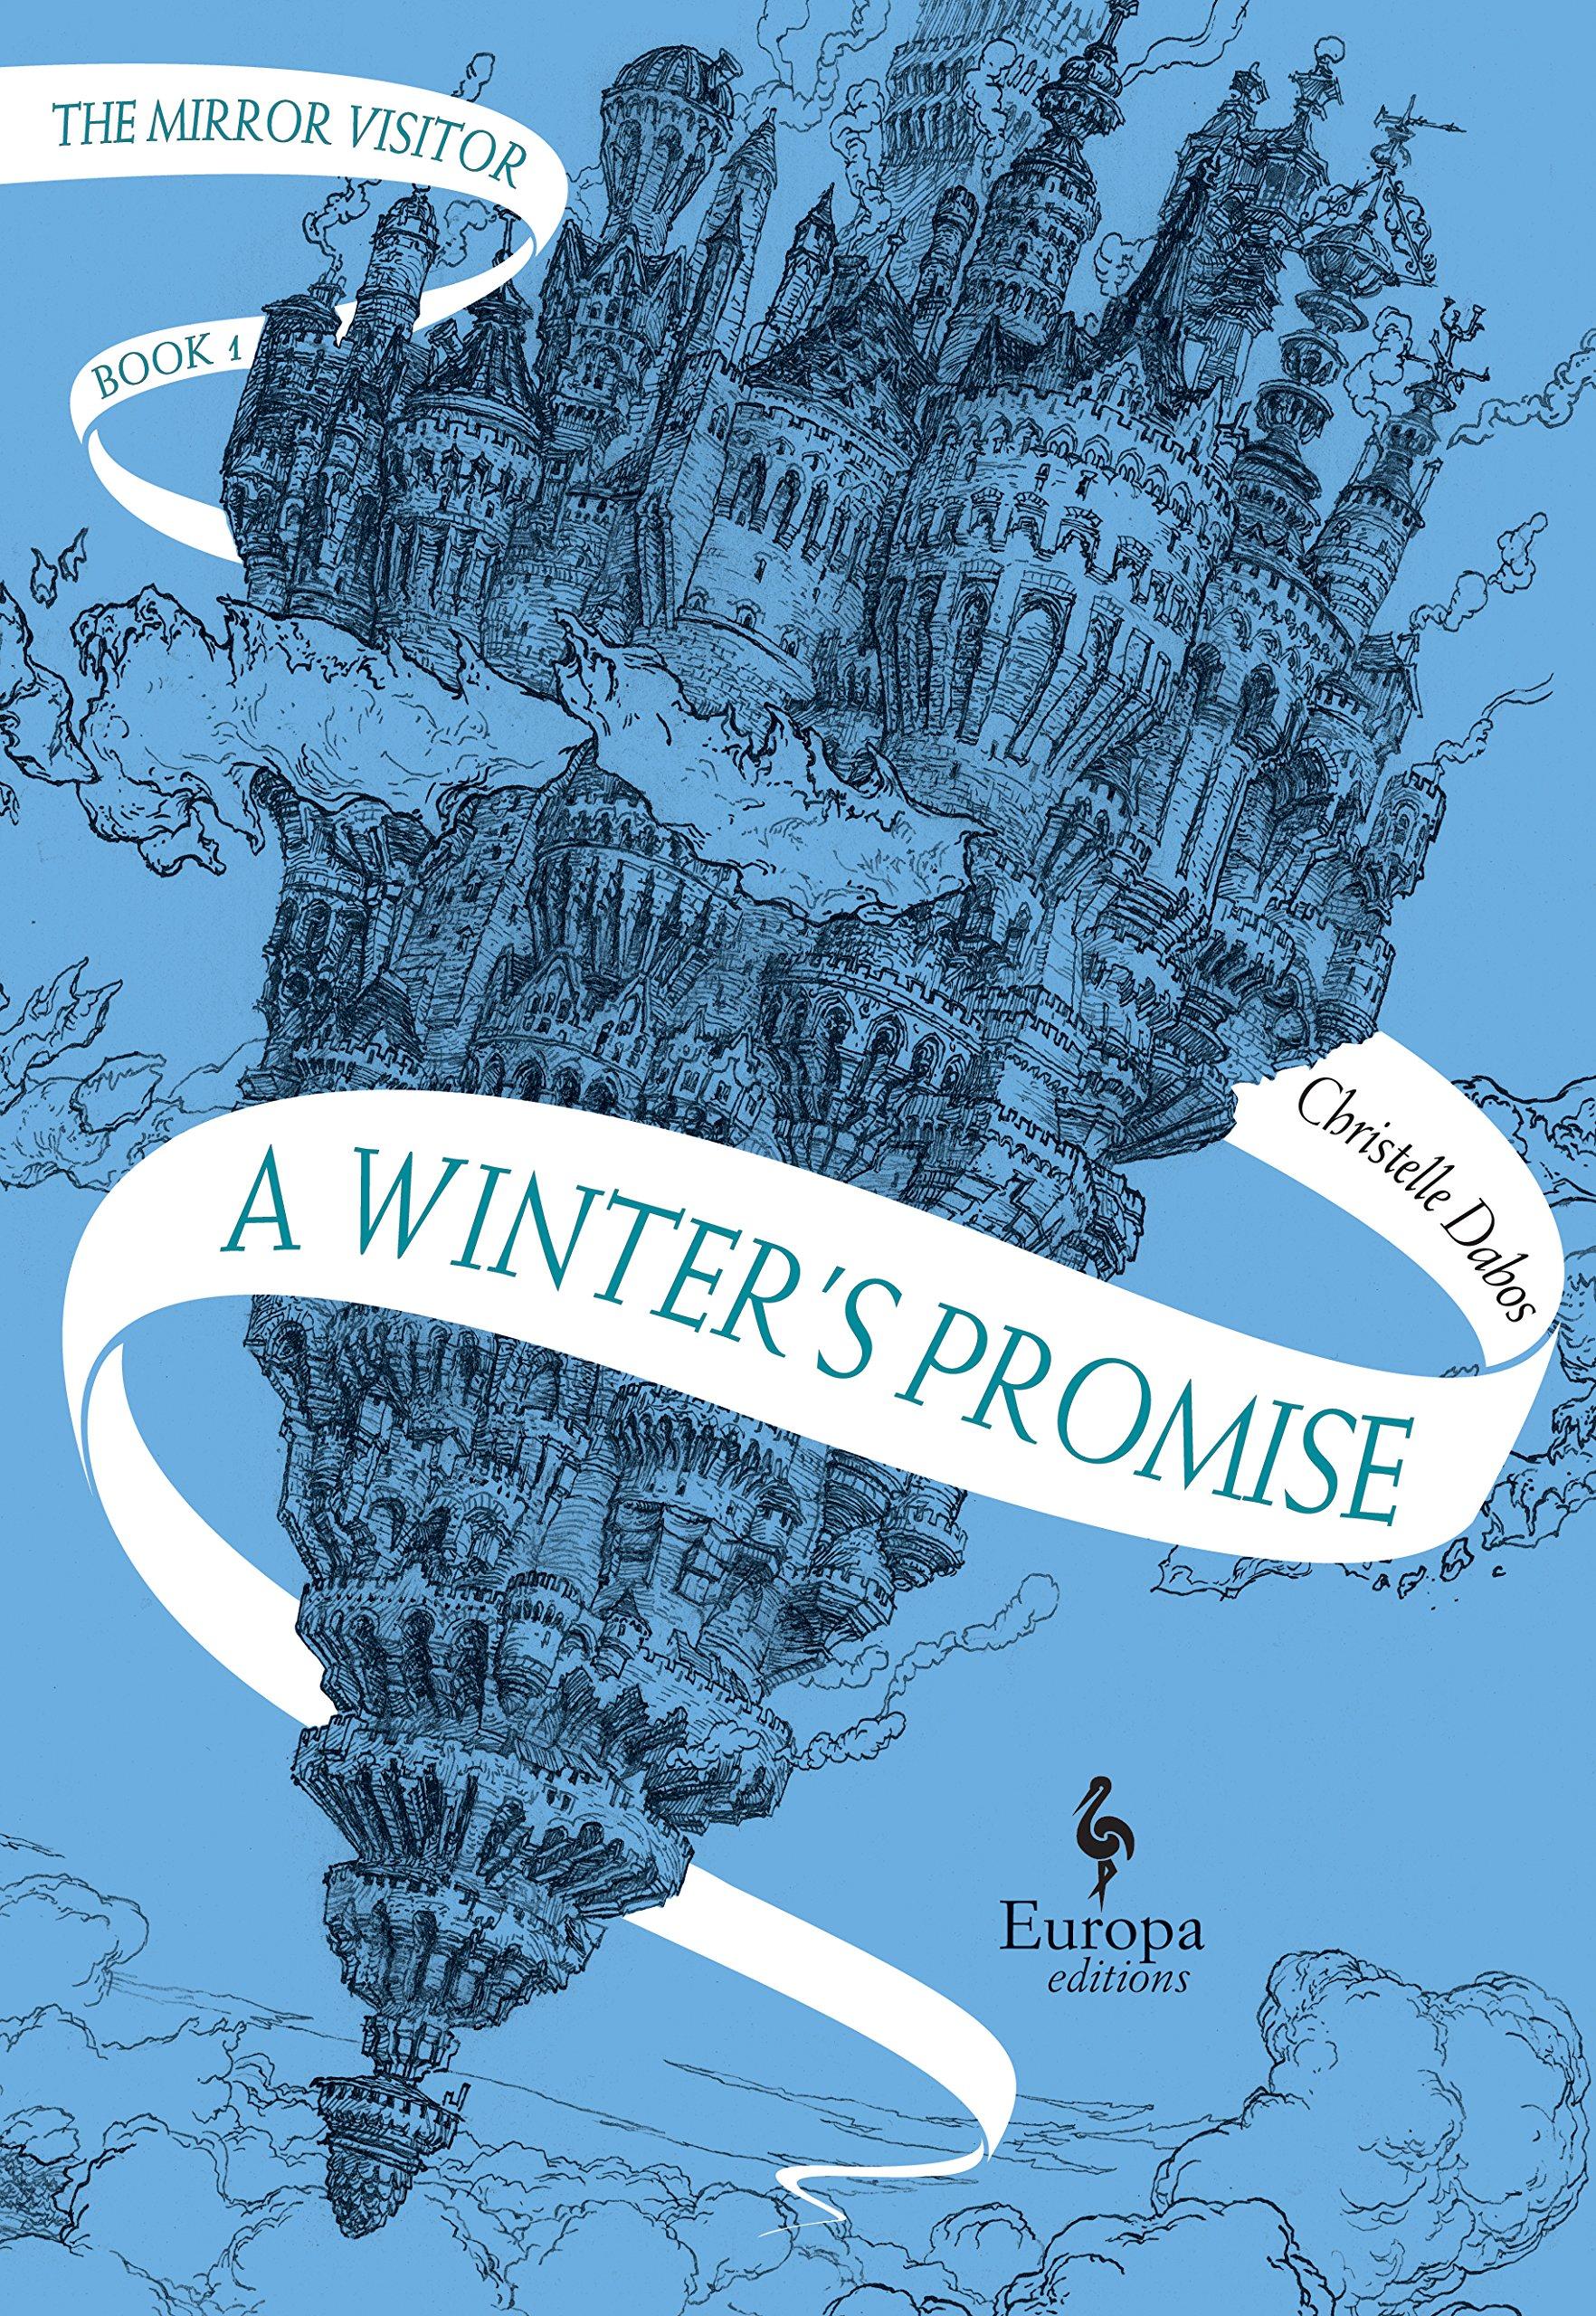 A Winter's Promise: Volume 1 of The Mirror Visitor Quartet: Book One of the  Mirror Visitor Quartet: Amazon.de: Dabos, Christelle: Fremdsprachige Bücher